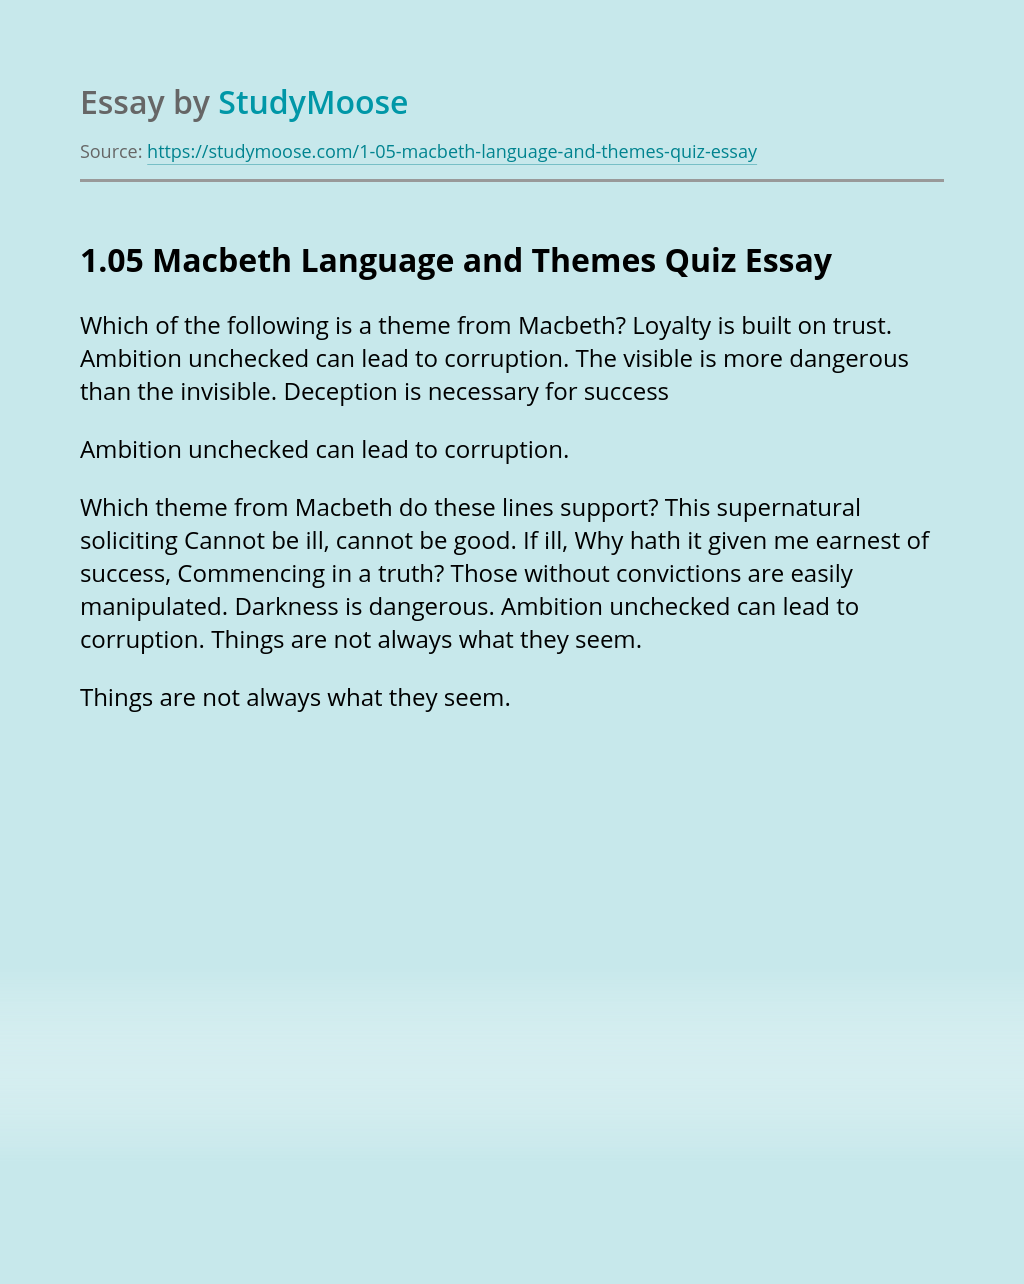 1.05 Macbeth Language and Themes Quiz